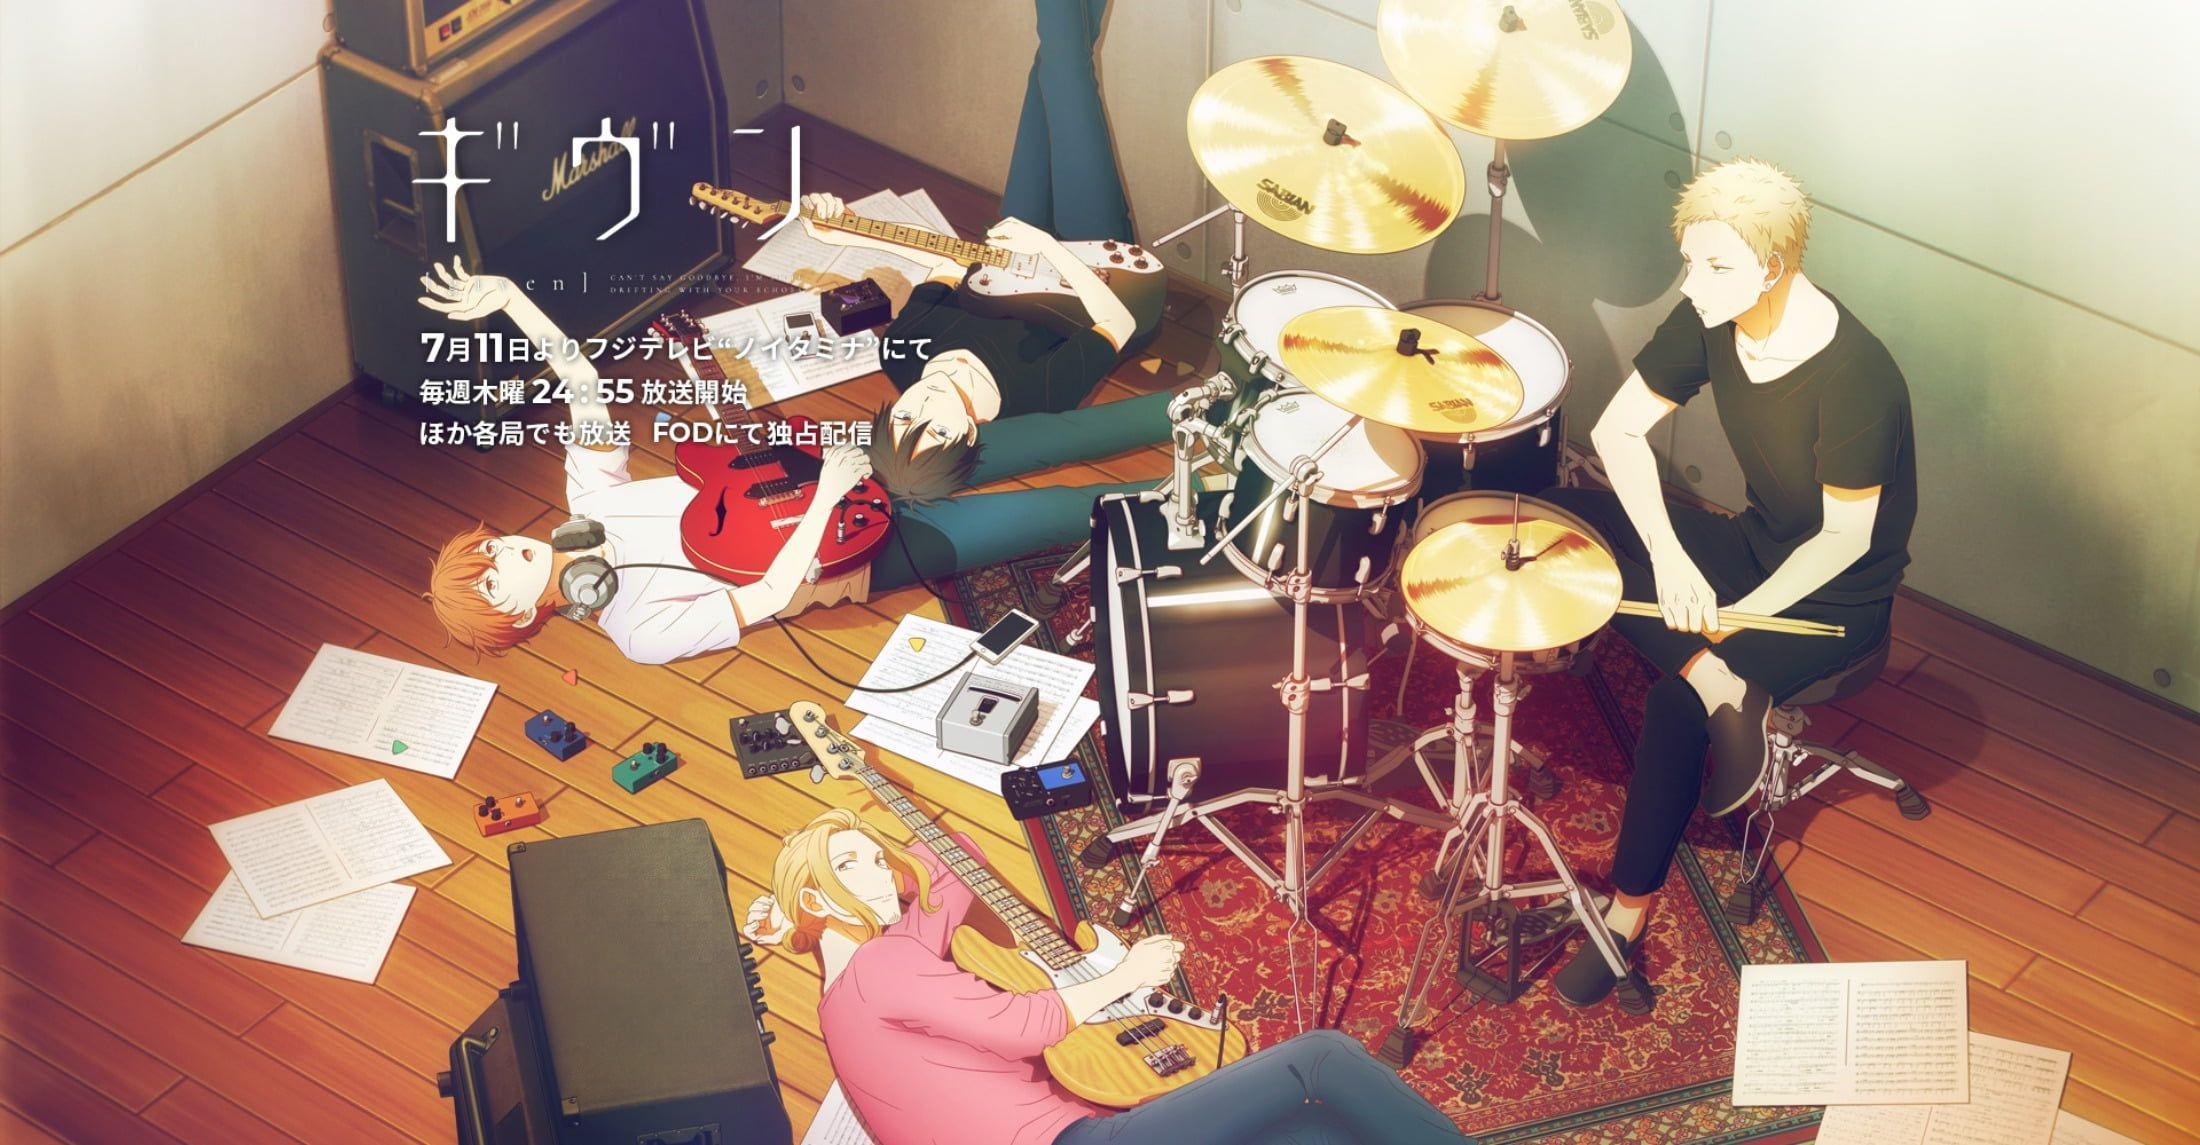 Given Uenoyama Ritsuka Sato Mafuyu Nakayama Haruki Kaji Akihiko Anime Anime Band Band Anime Boys 1080p Wall In 2021 Anime Wallpaper Download Anime Wallpaper Anime Given anime computer wallpaper